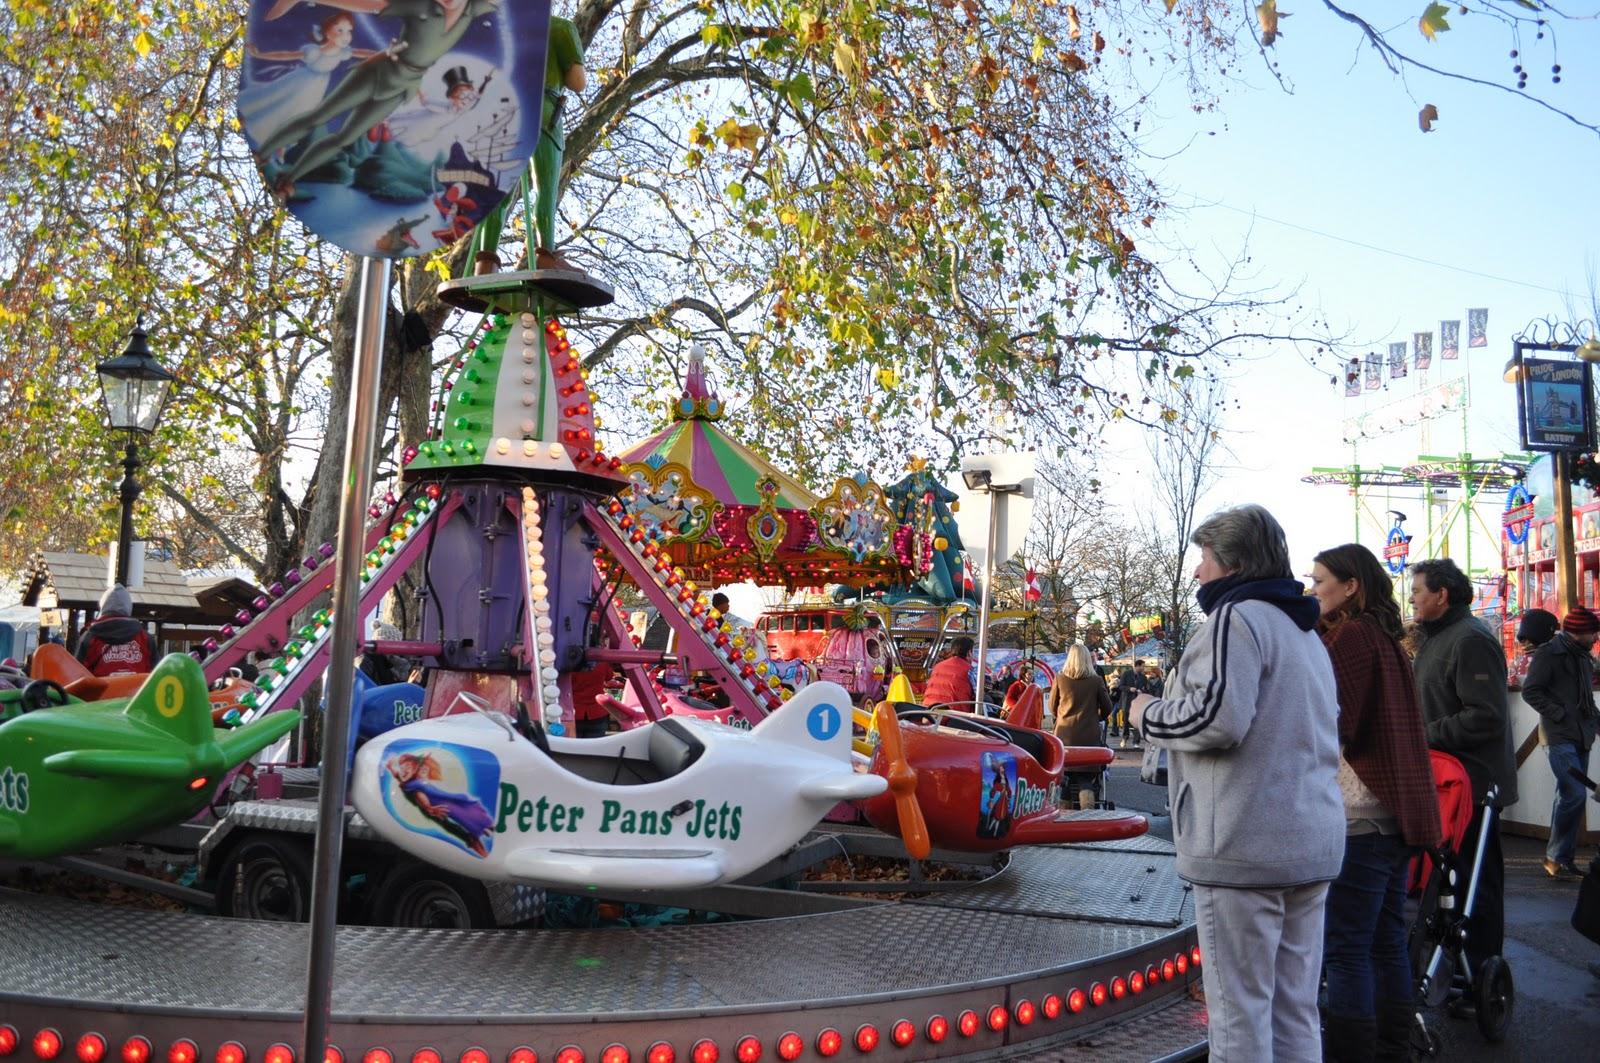 Winter Wonderland Hyde Park The Biggest Christmas Market